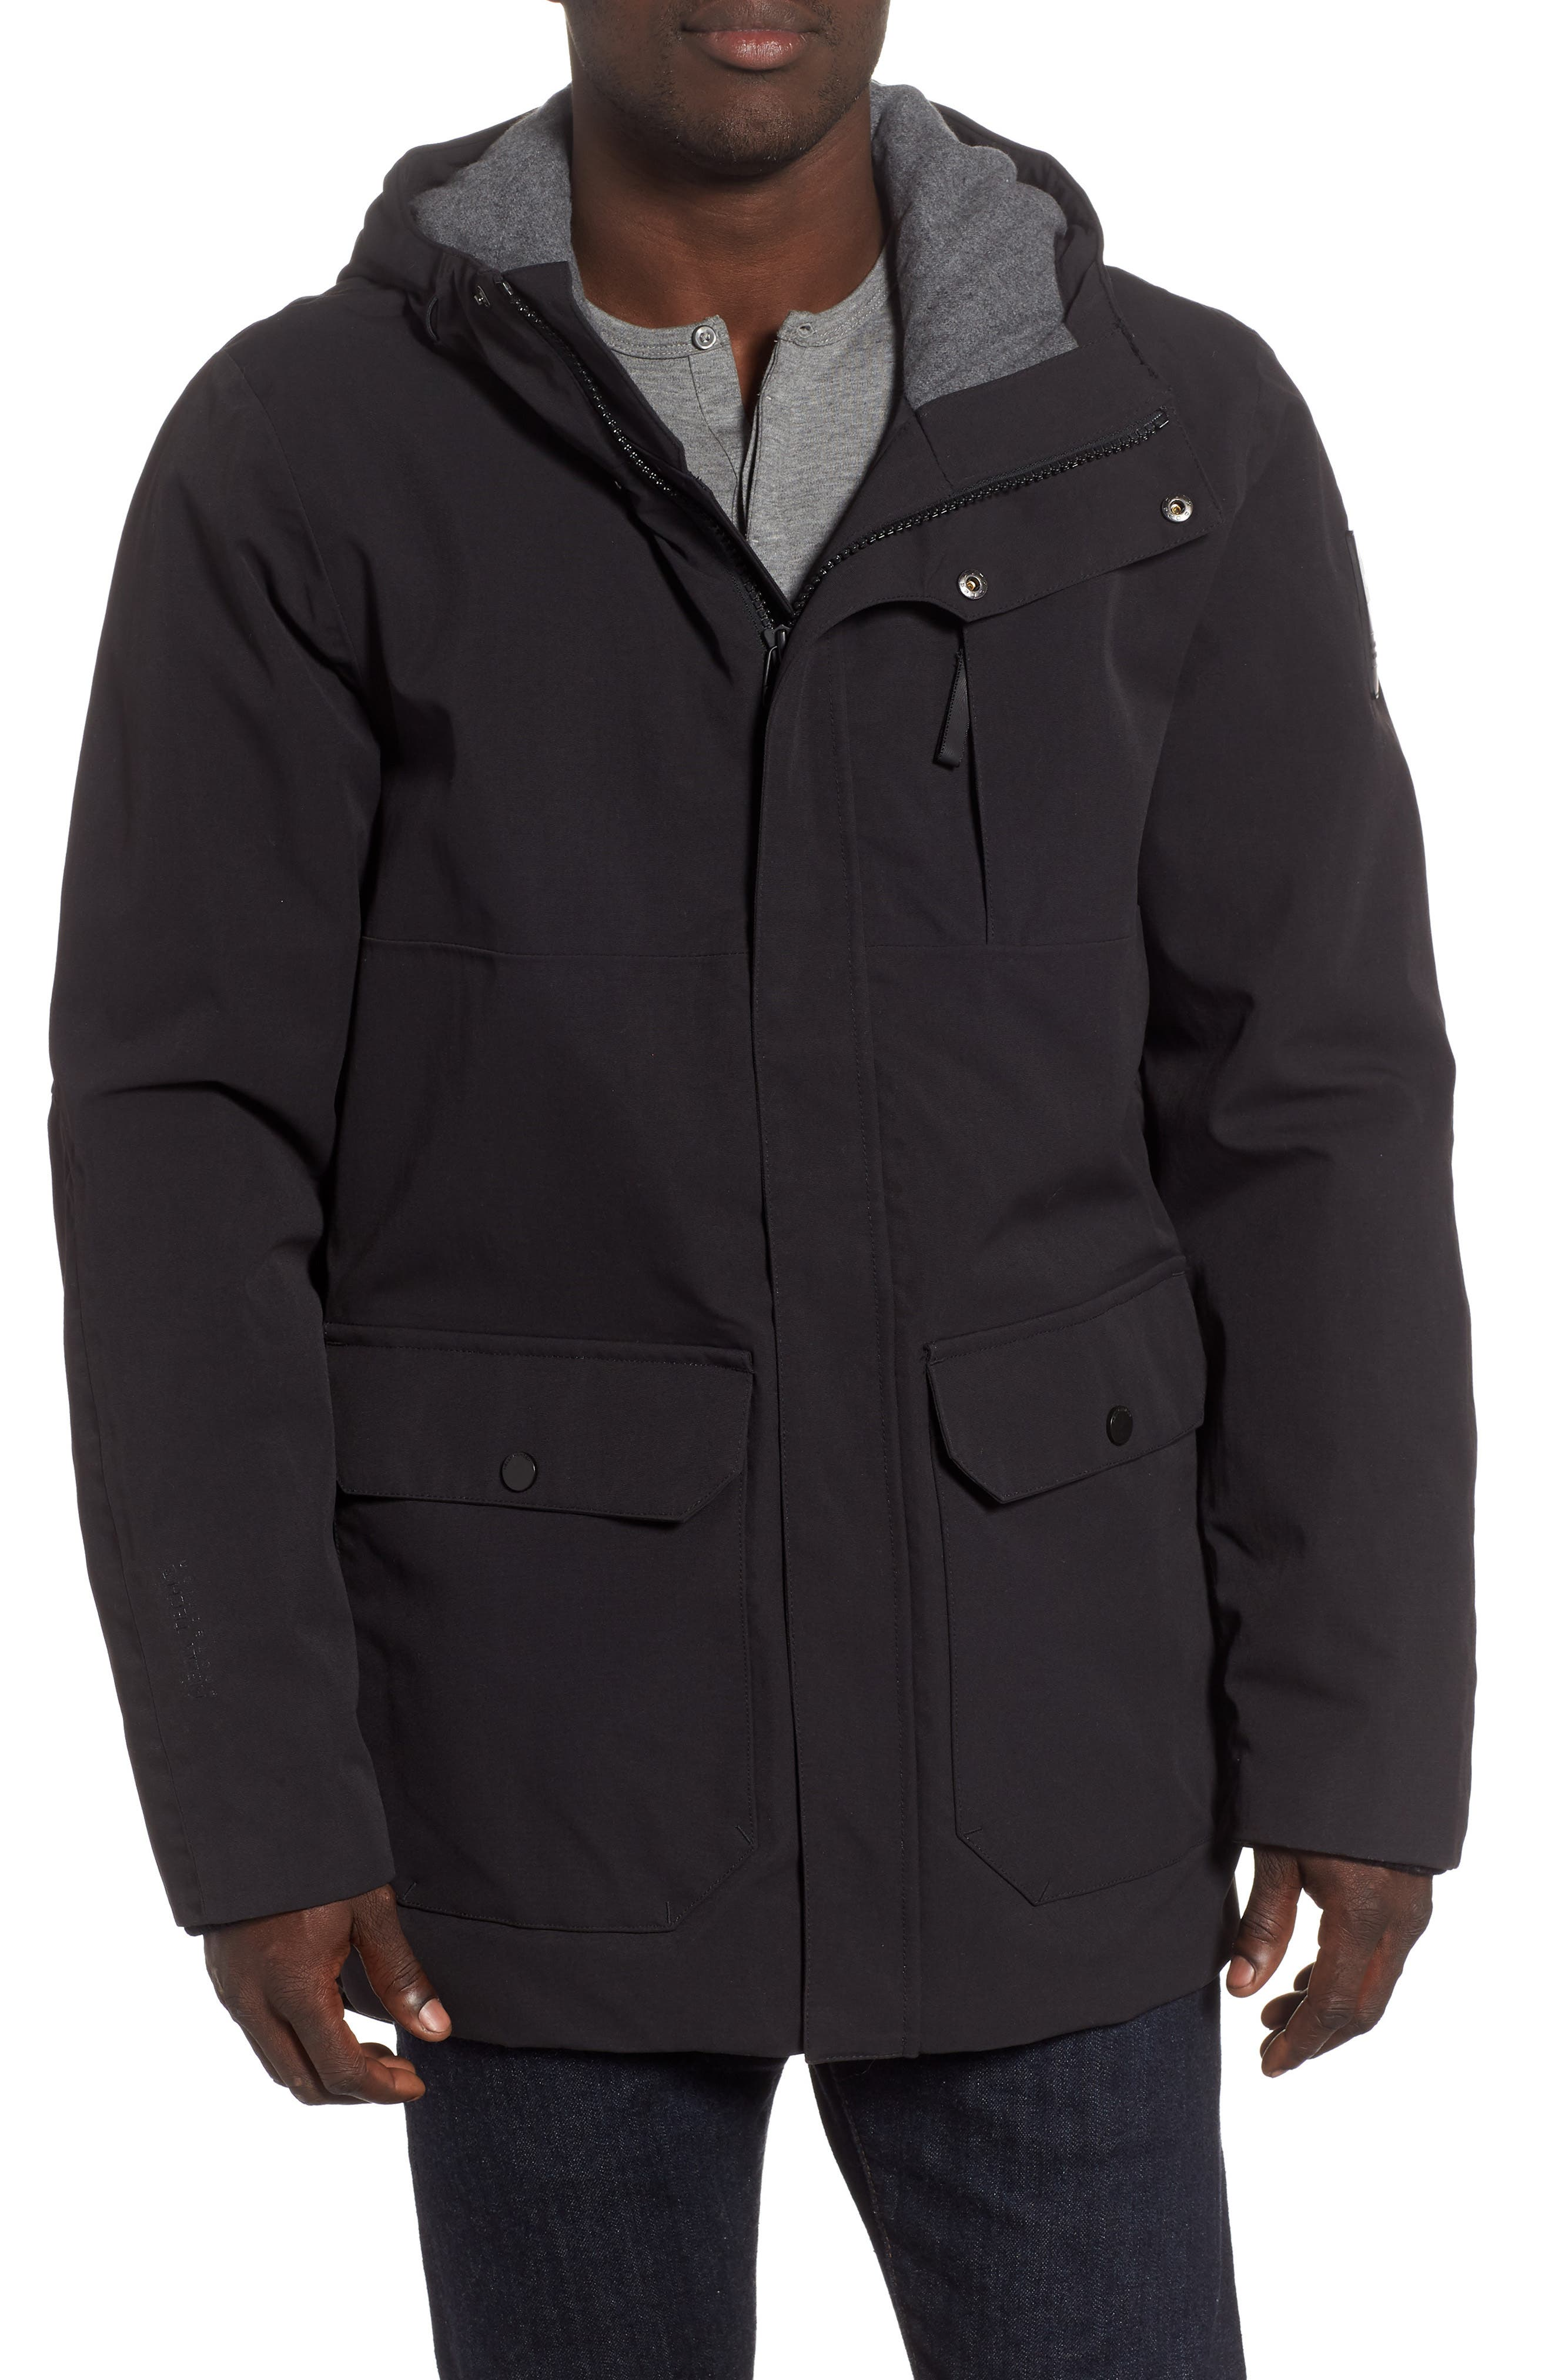 Urban Windproof & Waterproof Primaloft<sup>®</sup> Long Jacket,                         Main,                         color, BLACK